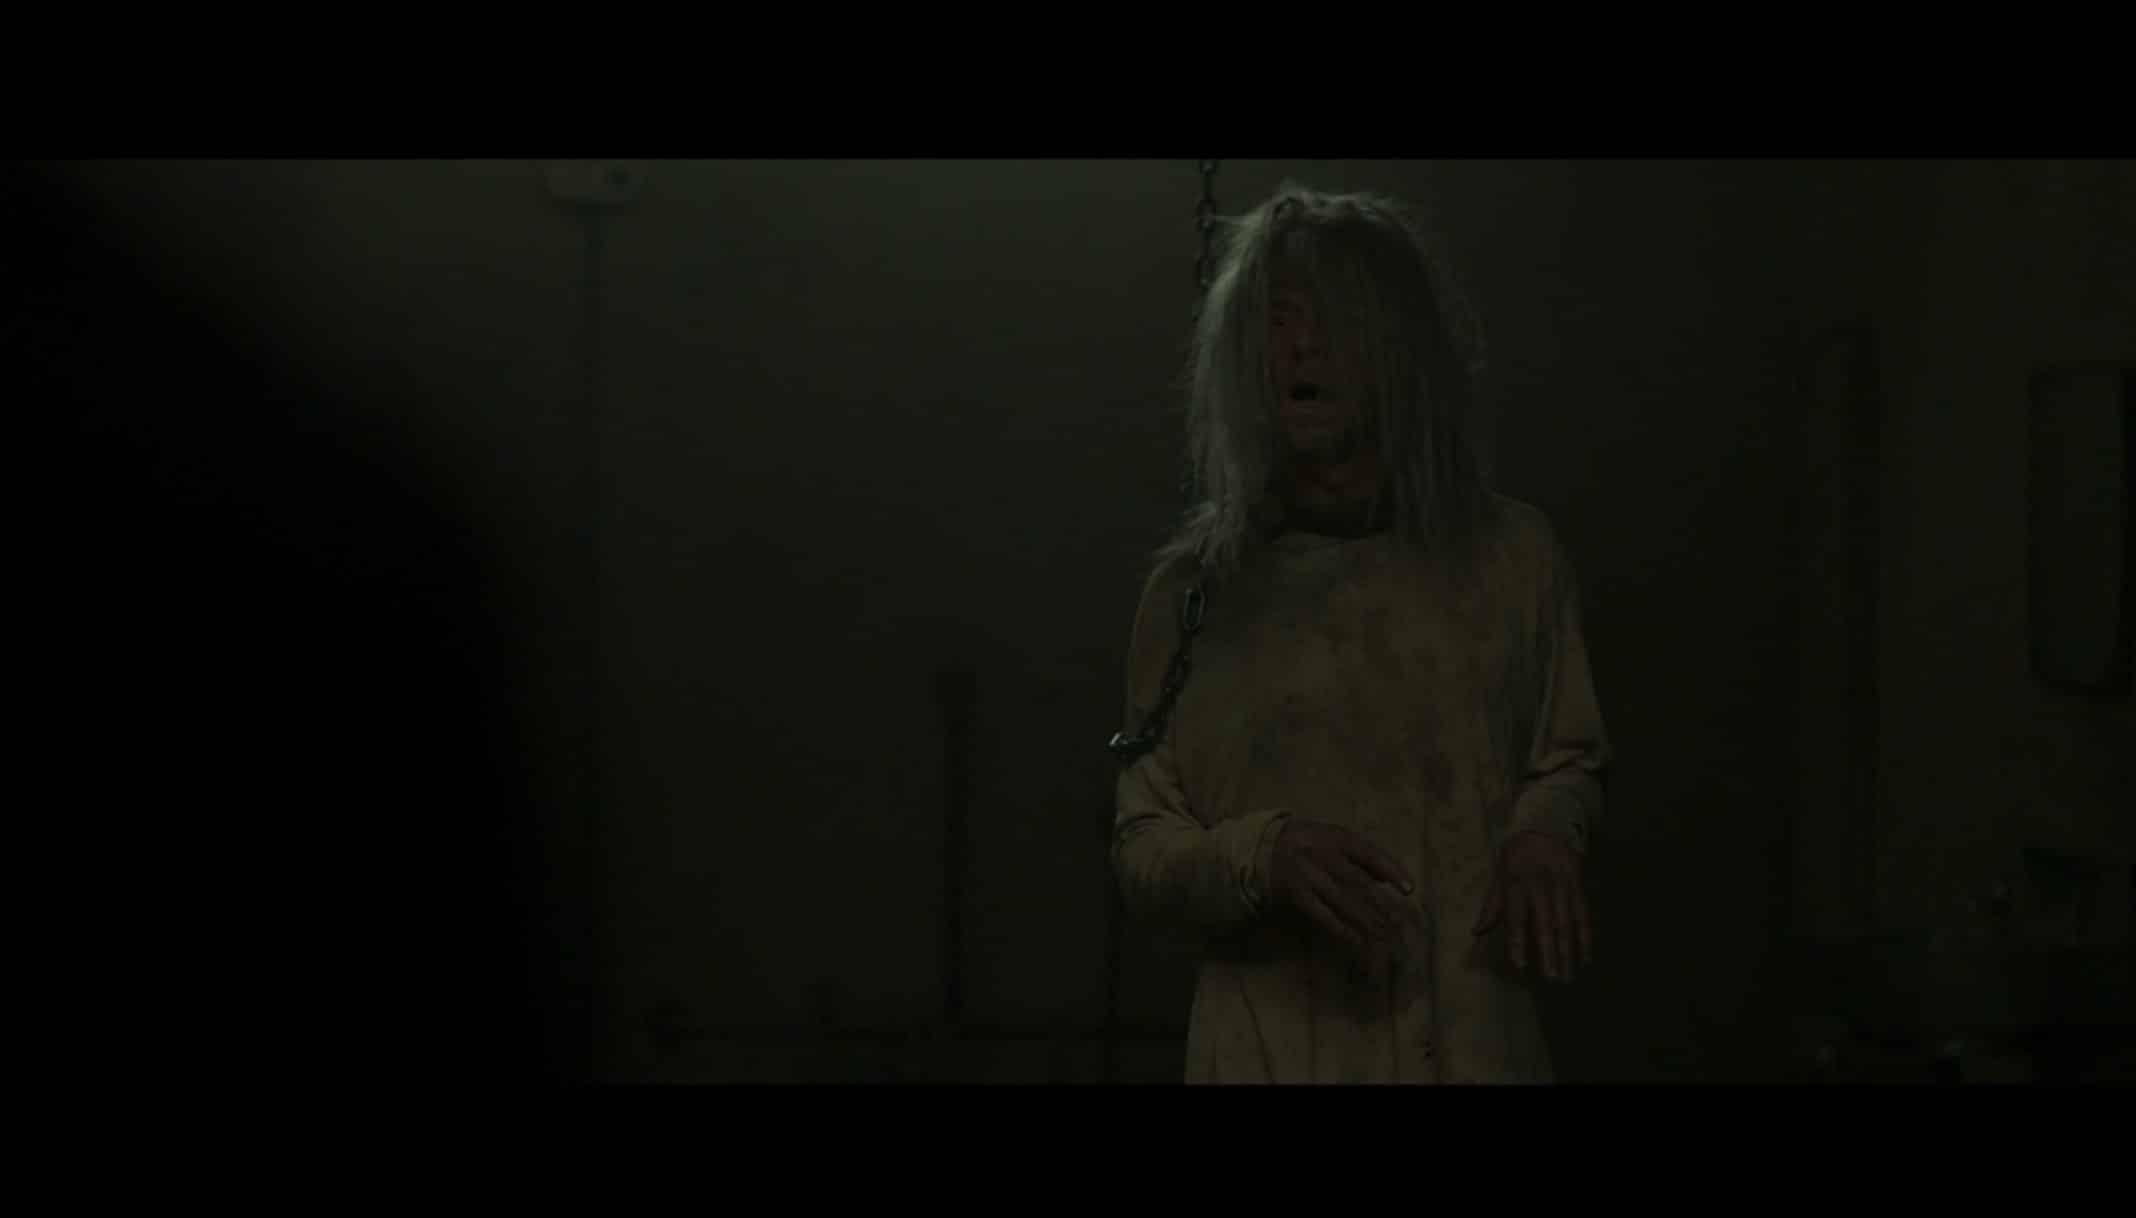 Morgan (Simon Pegg) in a dark room looking disheveled.